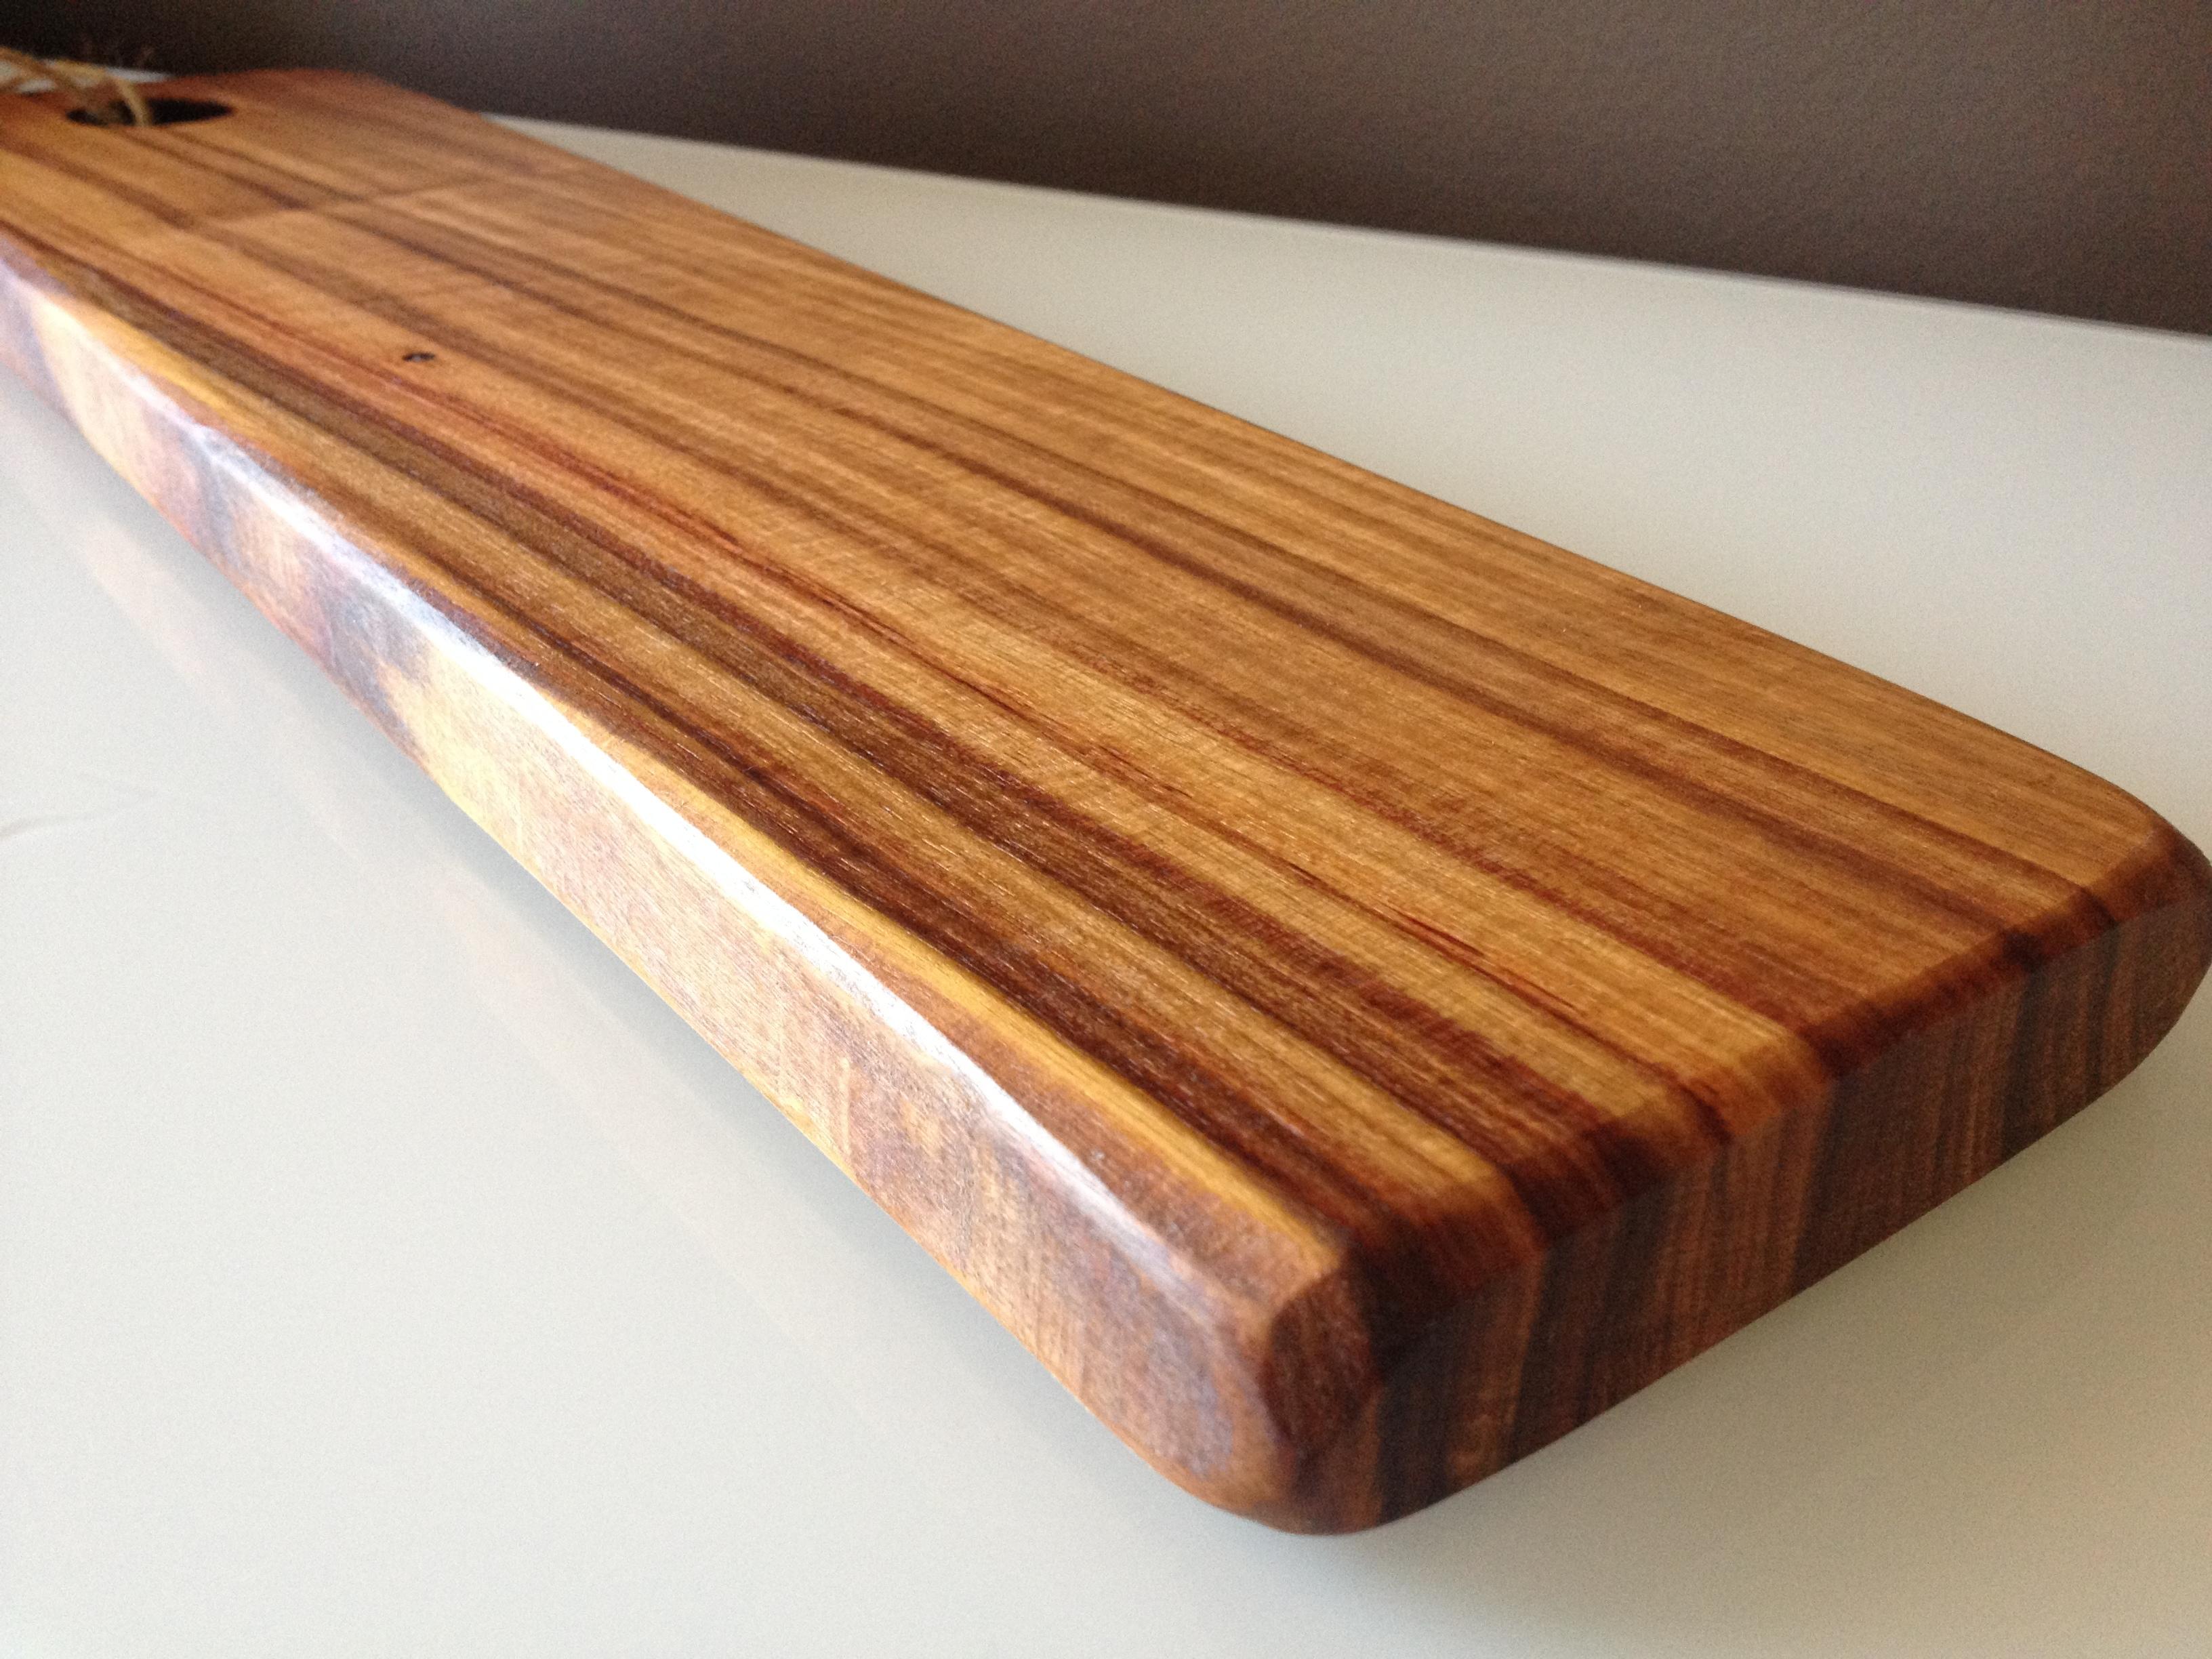 Wood Edged Board ~ African wood cutting board natural edge